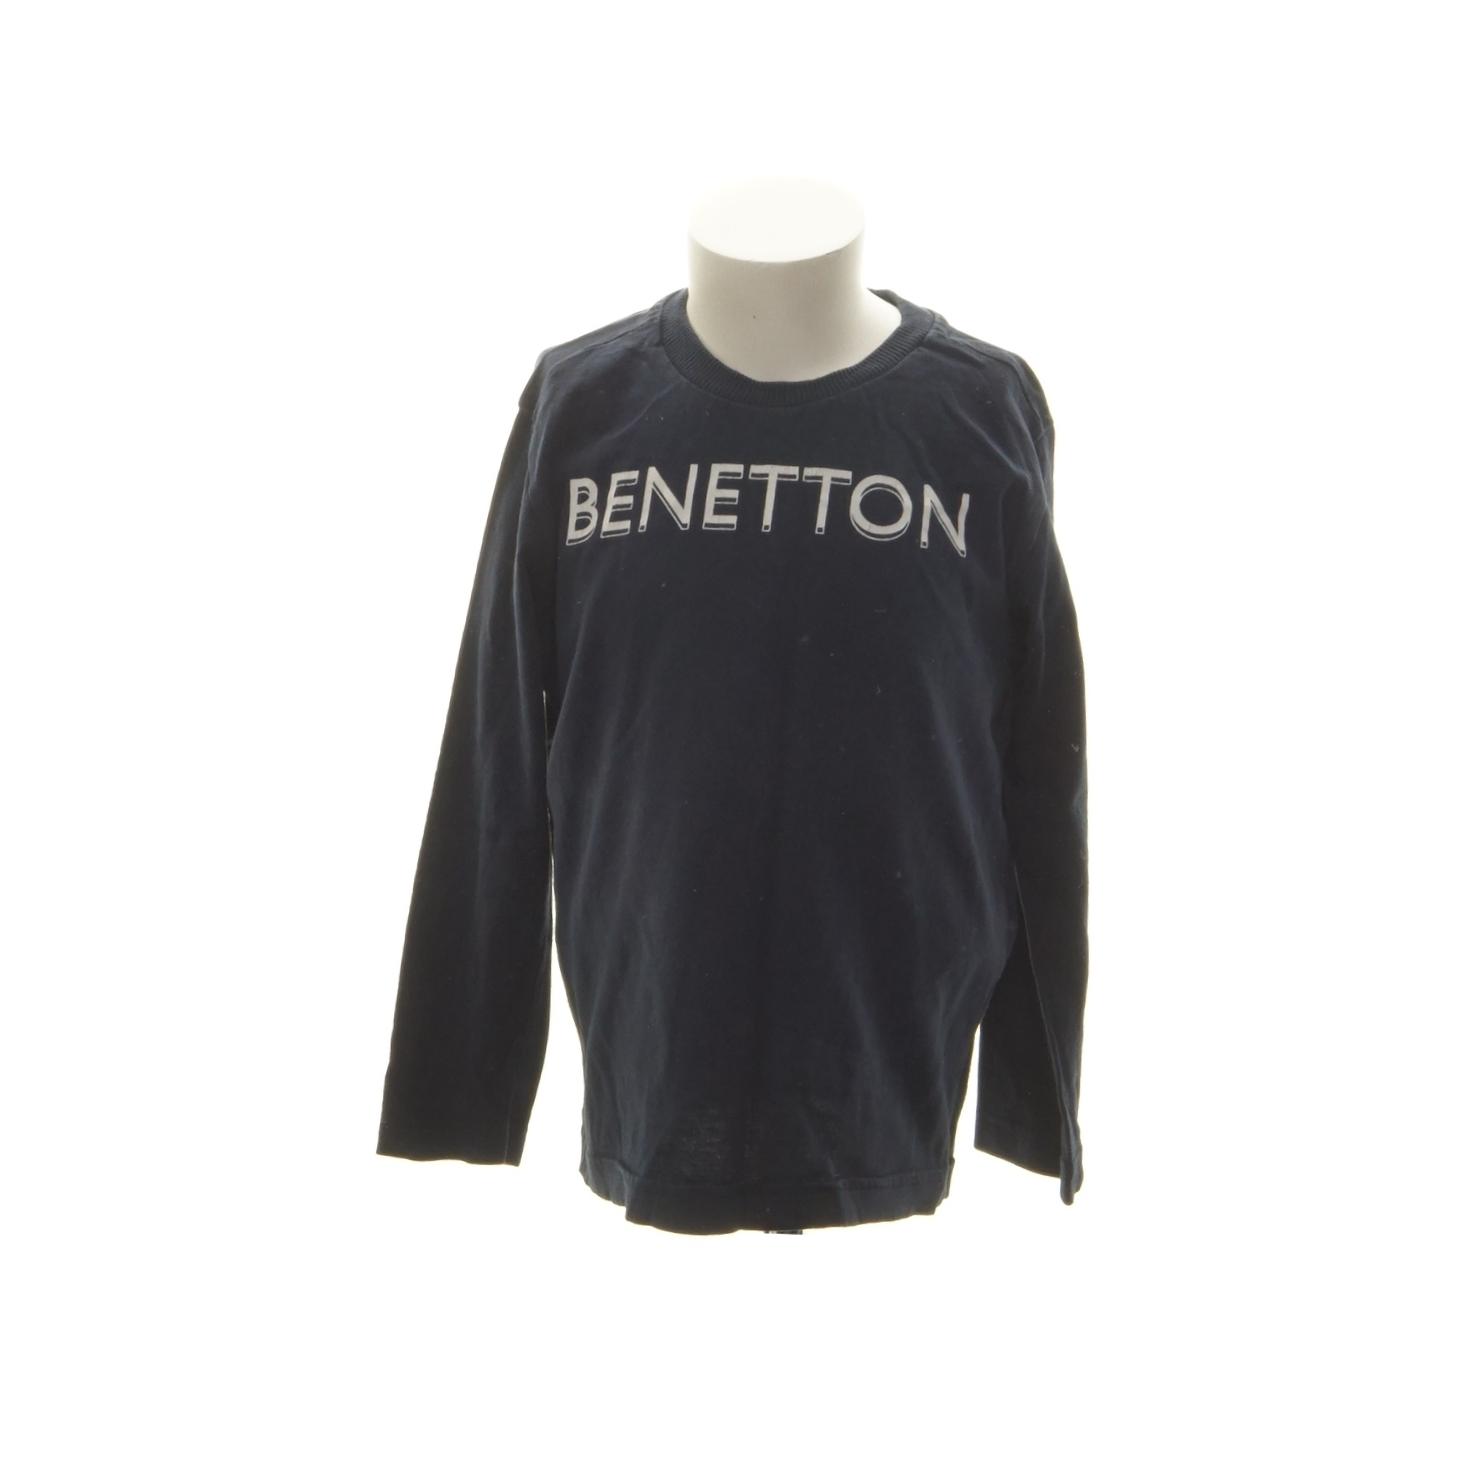 Tröja (Mörkblå) från United Colors of Benetton  c7db55d1a8050